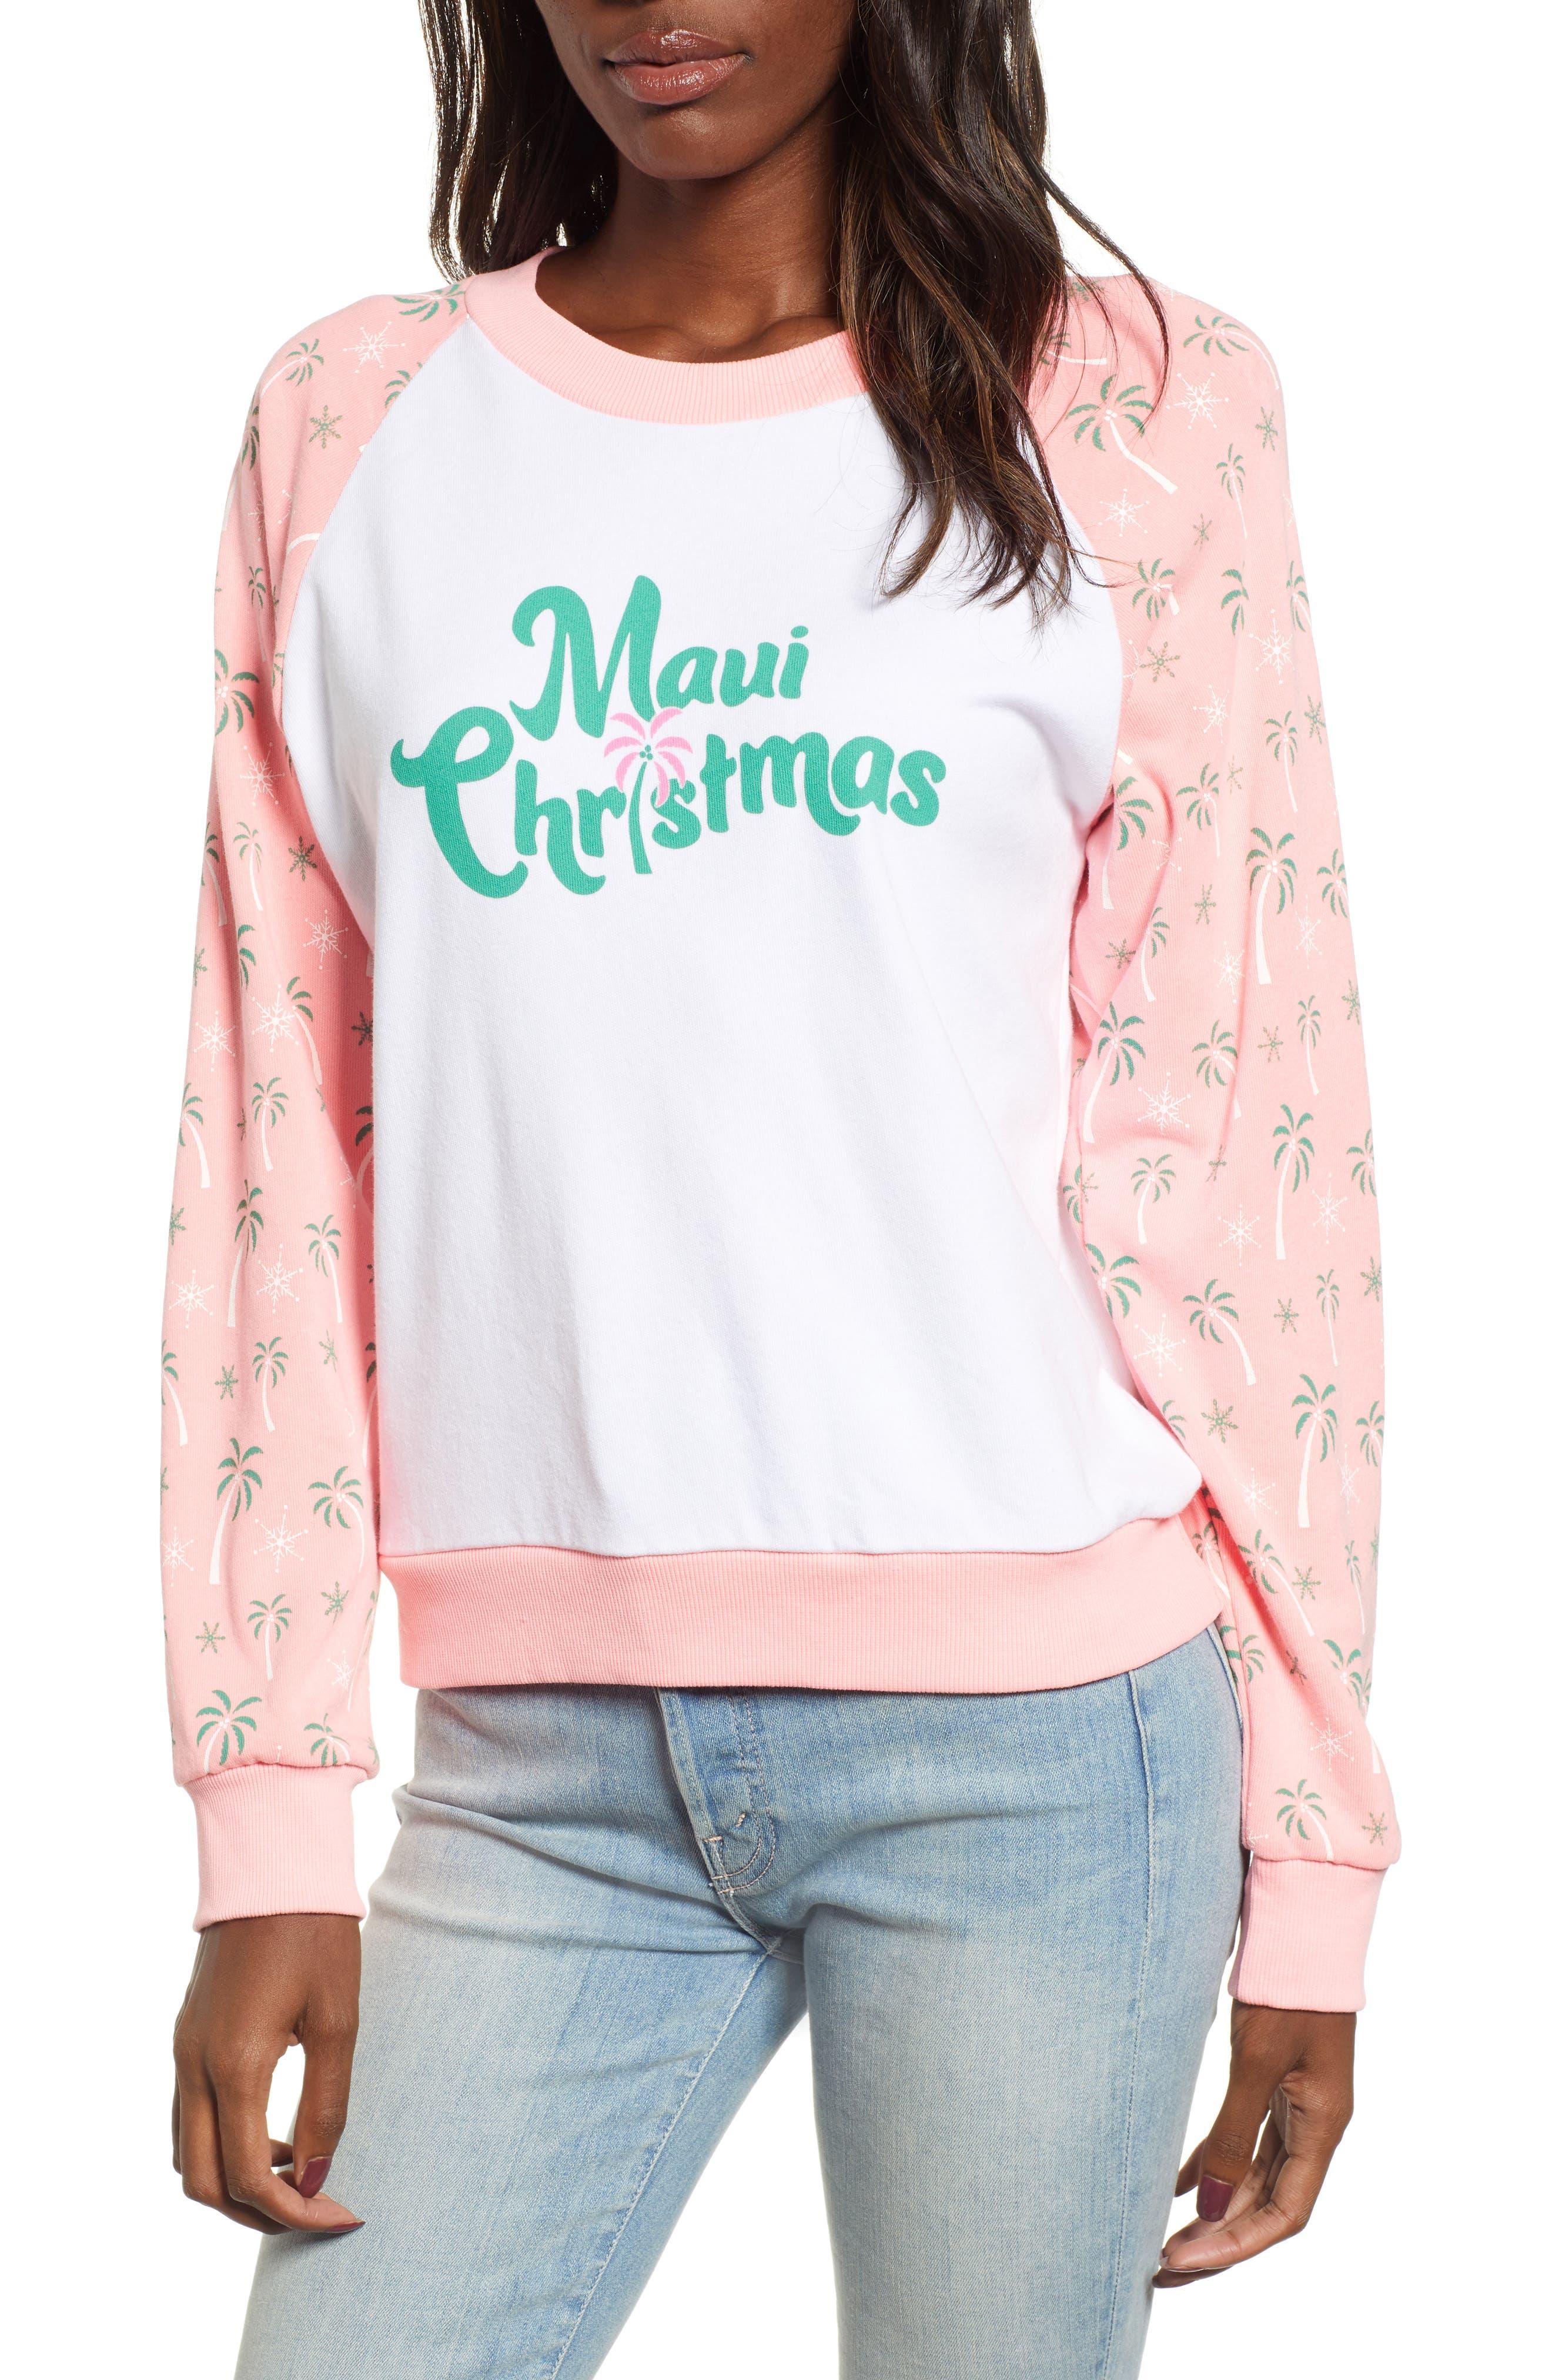 Maui Christmas Fiona Sweatshirt,                             Main thumbnail 1, color,                             CLEAN WHITE NEON SIGN